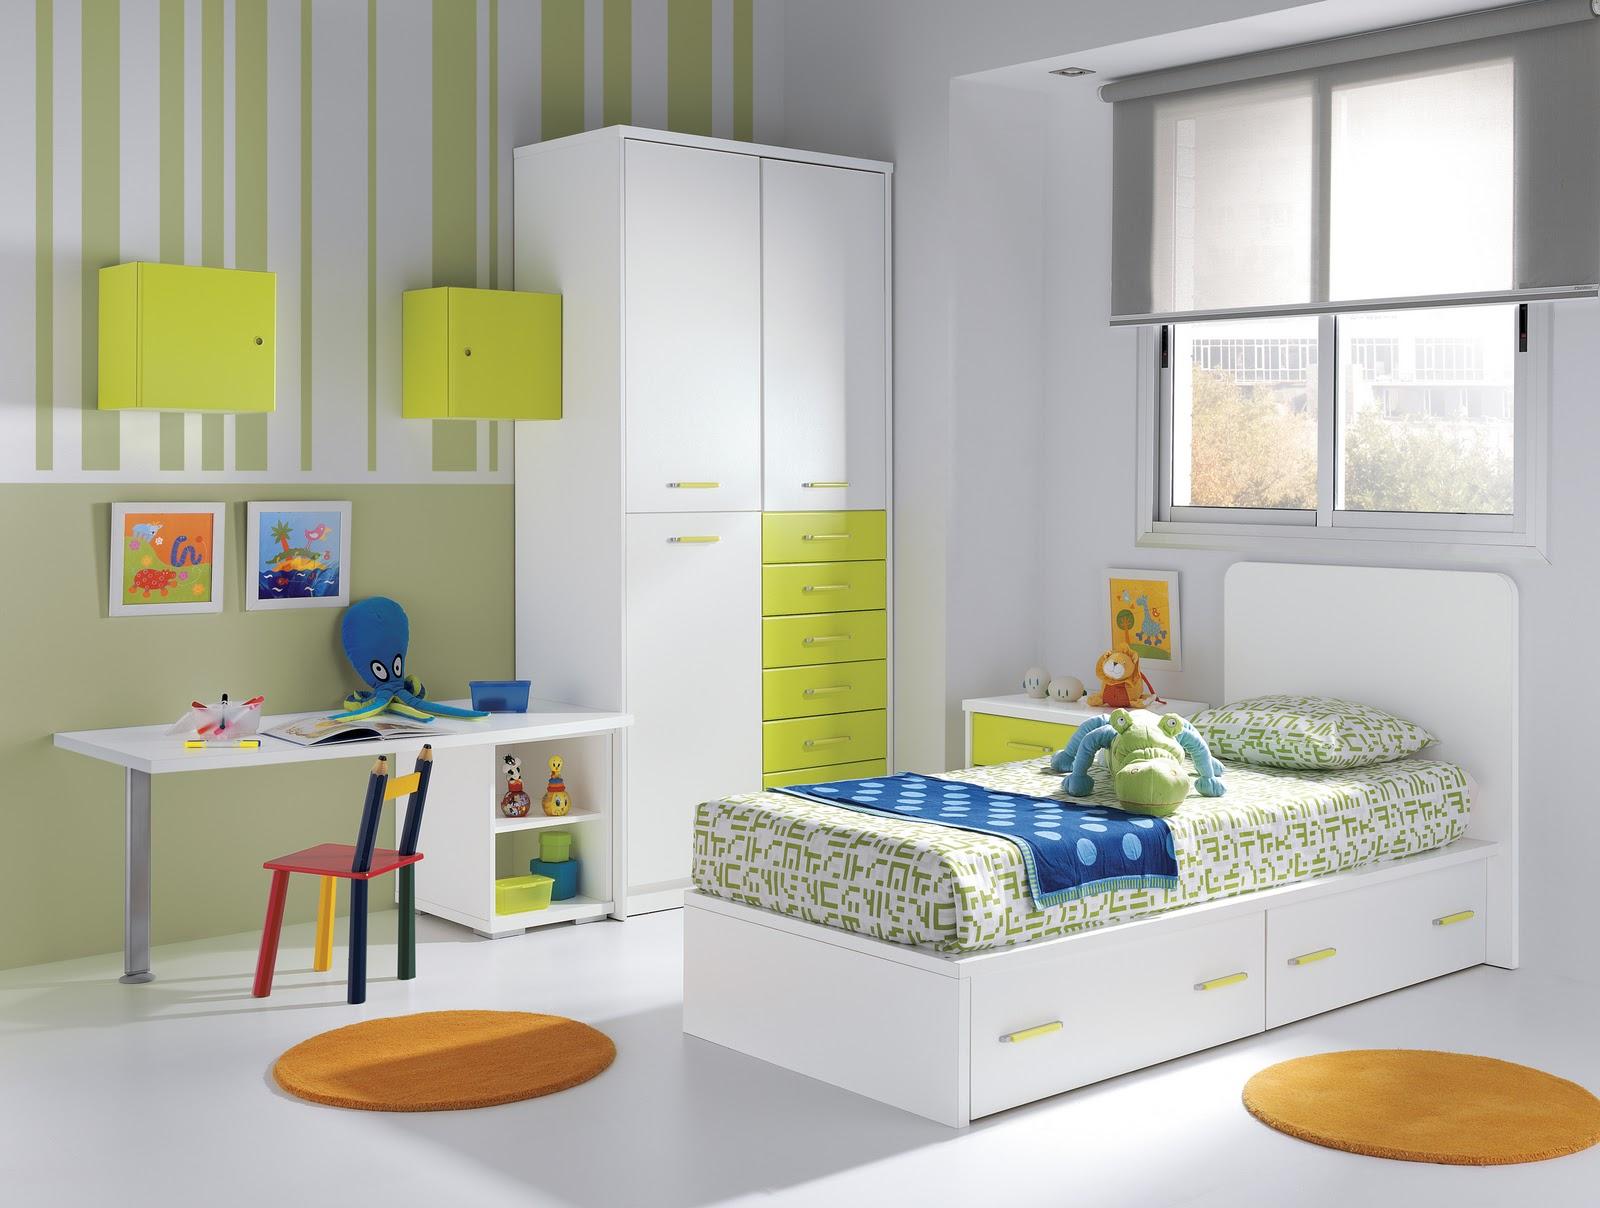 Consejos decoraci n hogar for Consejos decoracion hogar